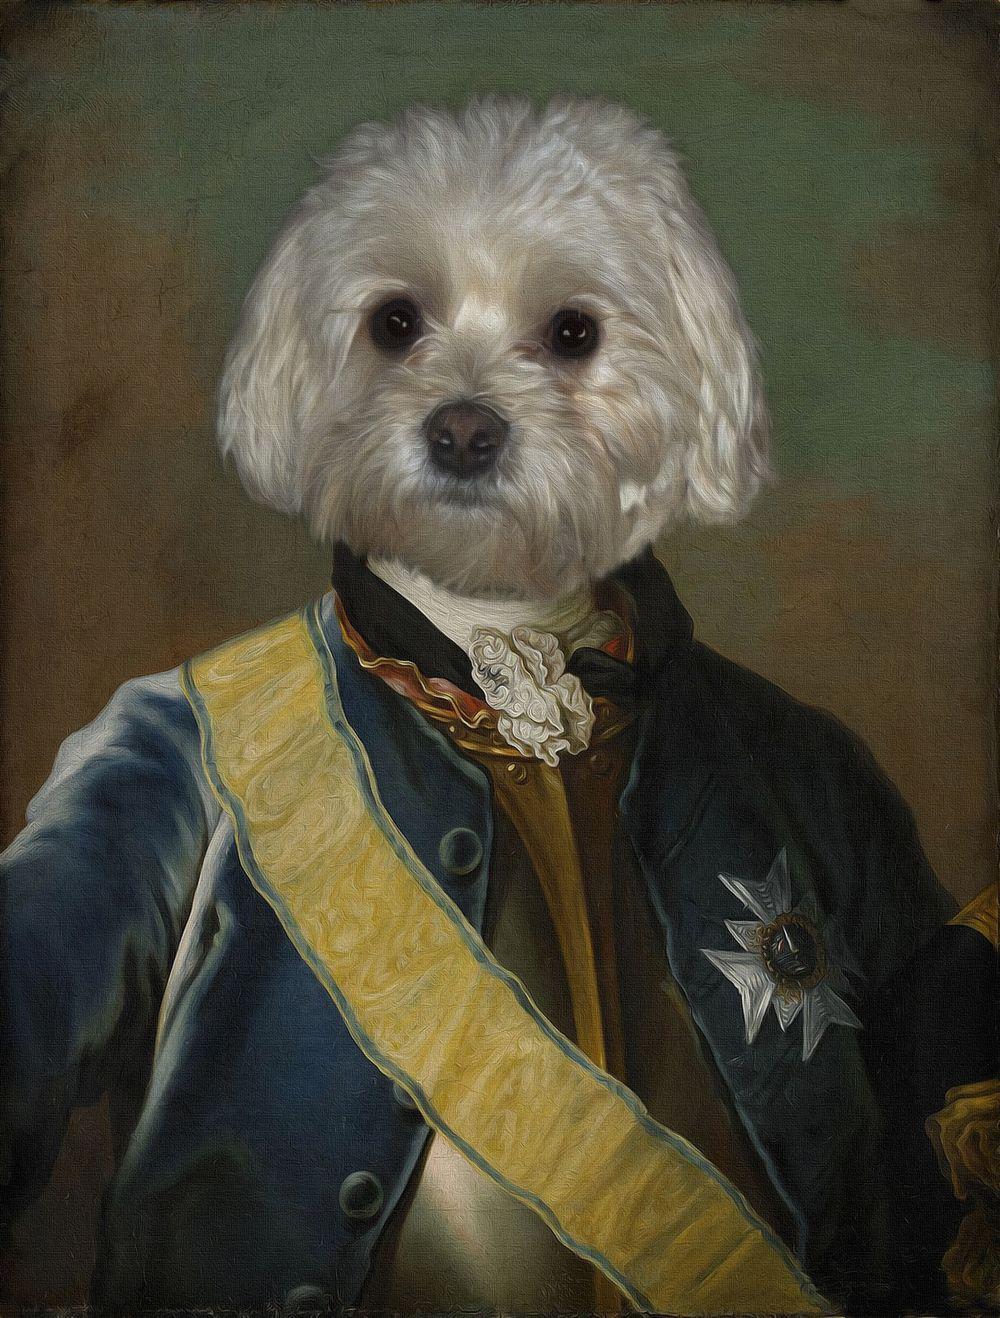 Anthropomorphic Dog Digital Art Samara Rabinowitz In 2019 Dog